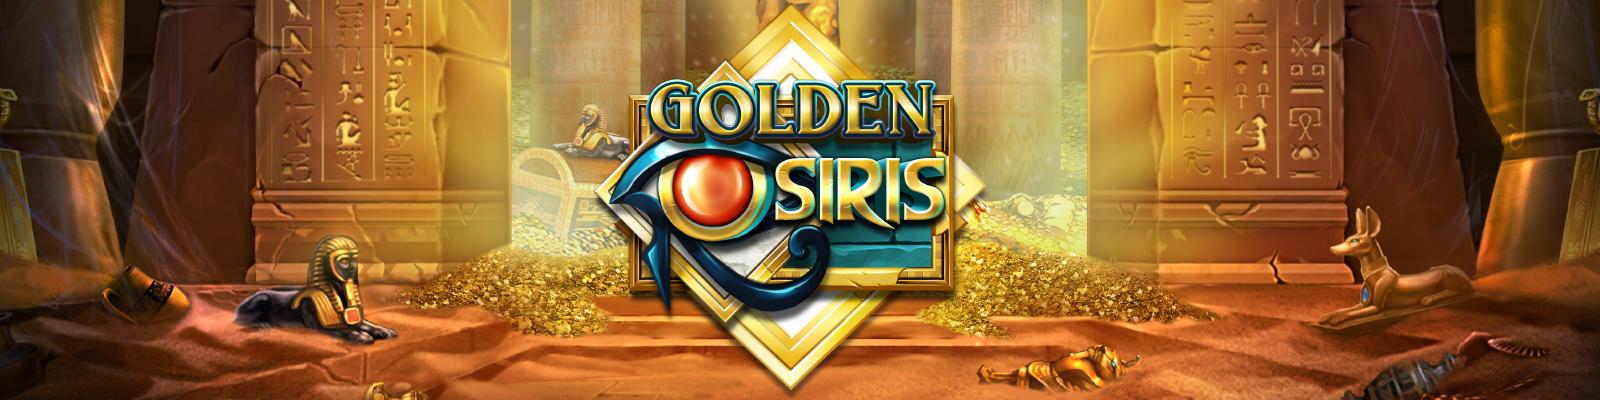 Golden Osiris from Play'n GO